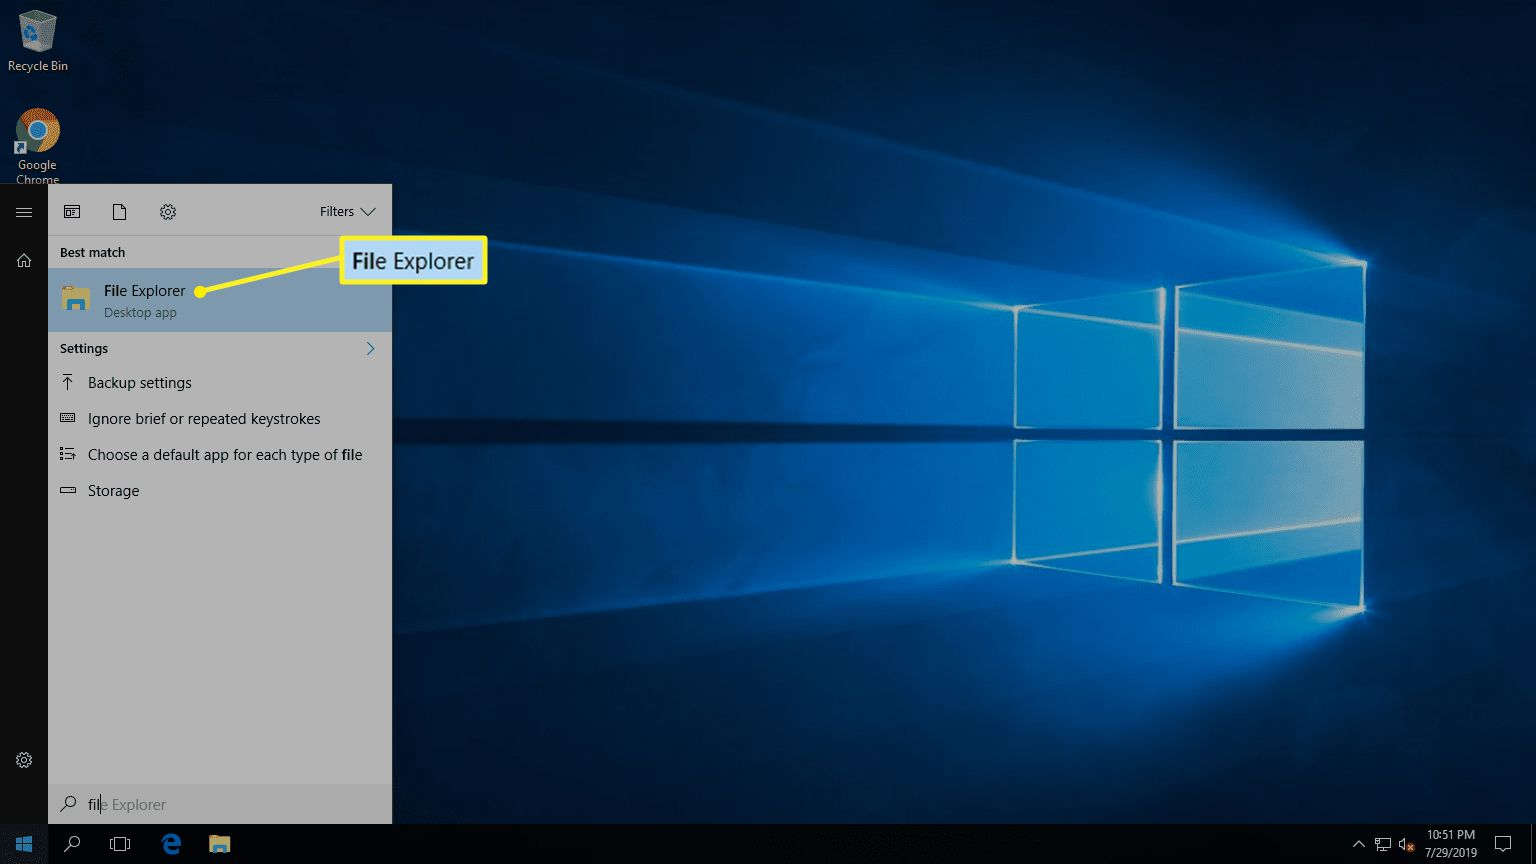 File Explorer from the Start Menu in Windows